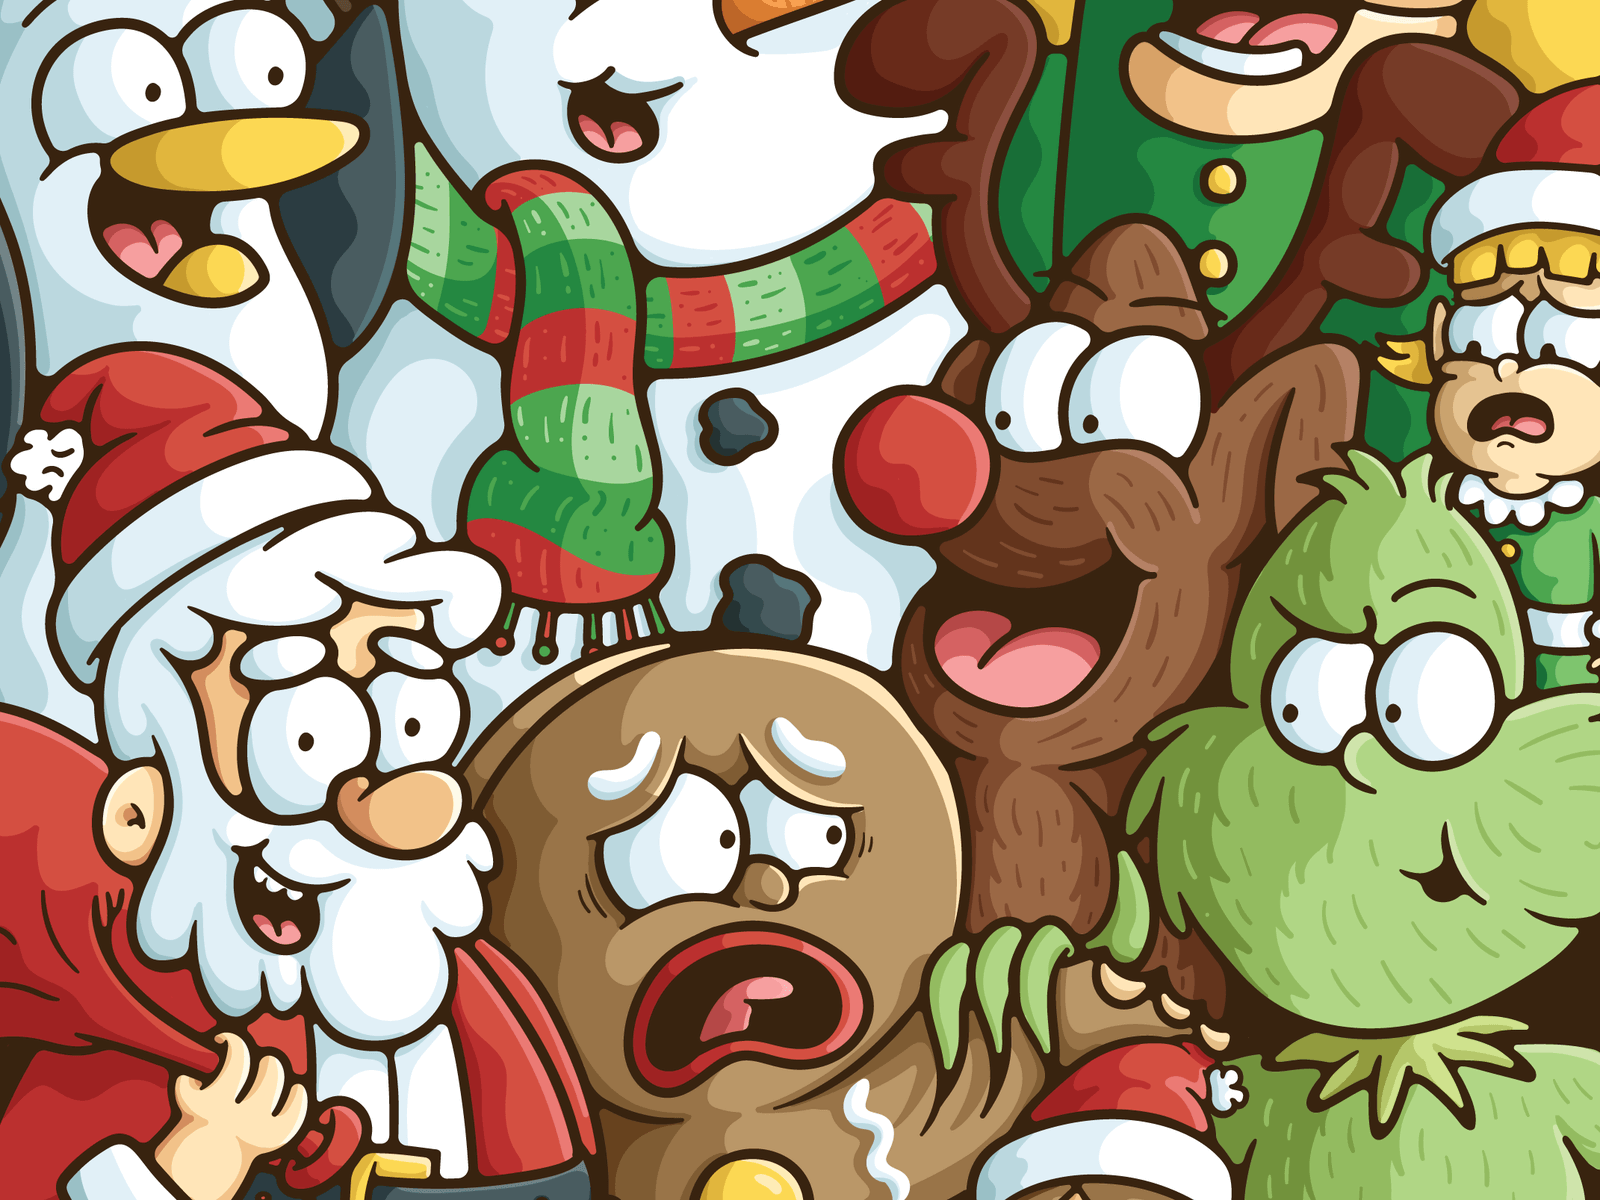 Christmas Character Mashup by Mackenzie Child via Dribbble